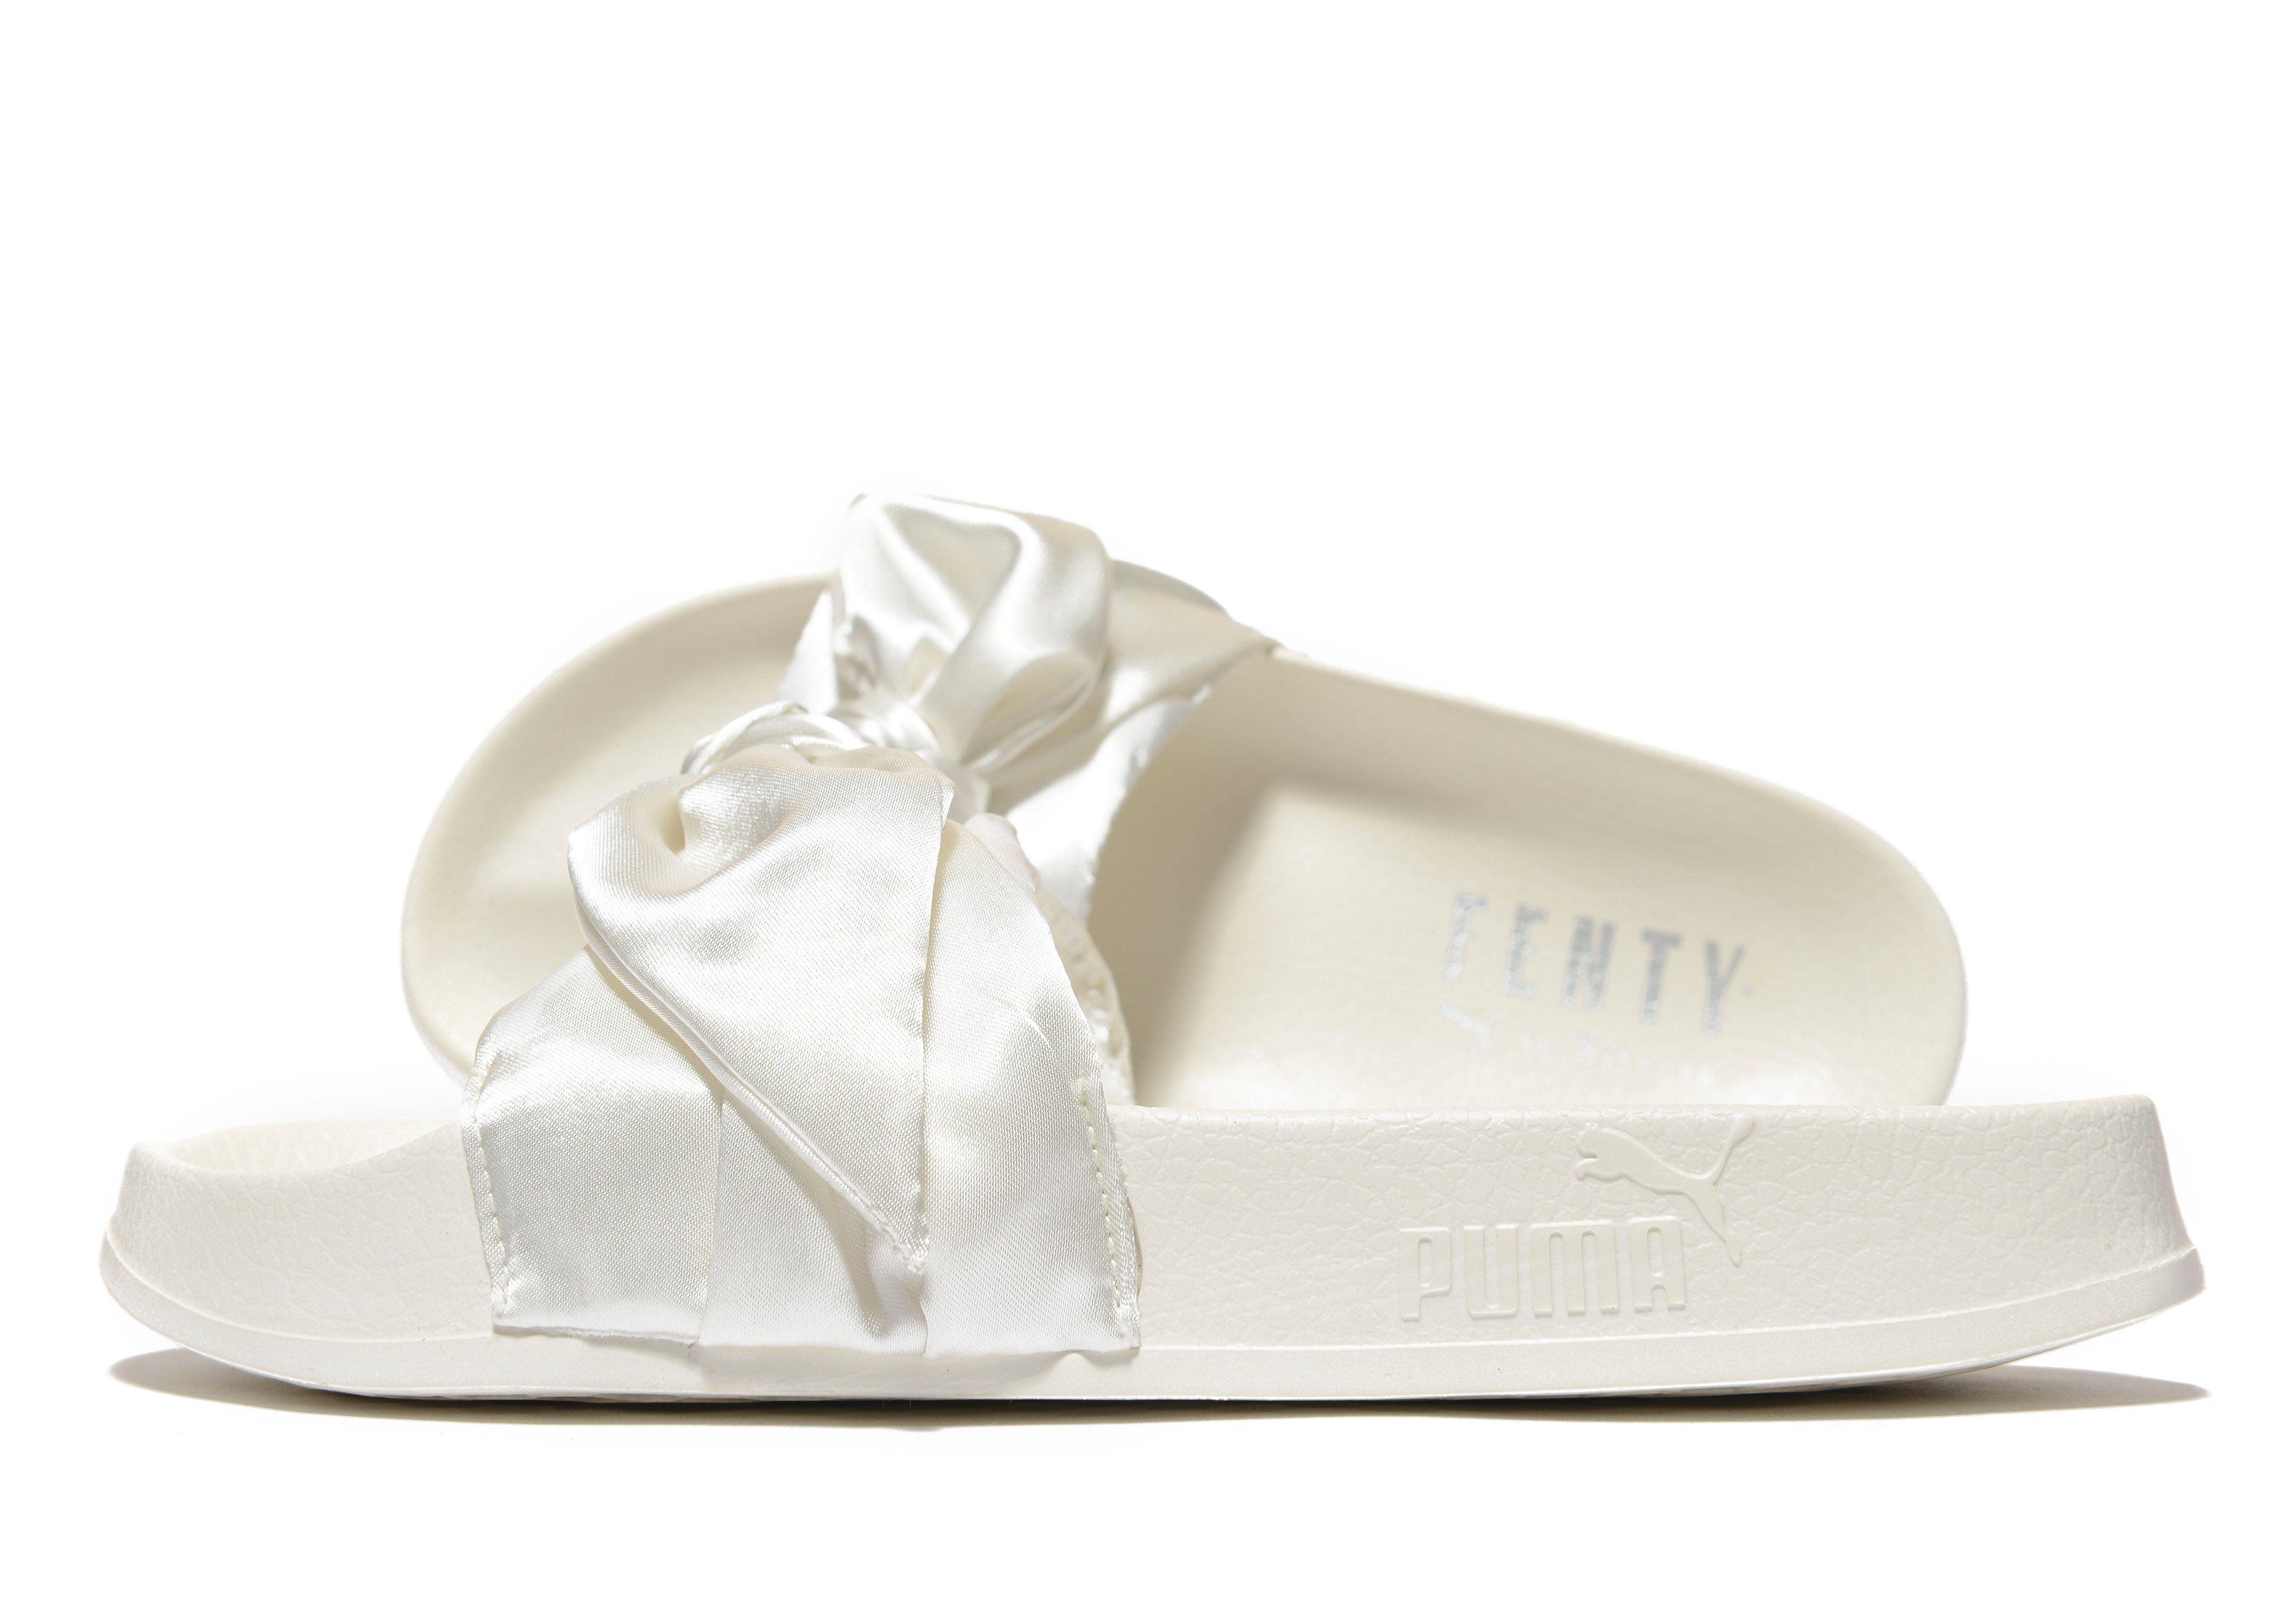 PUMA Fenty Bow Slide Women's